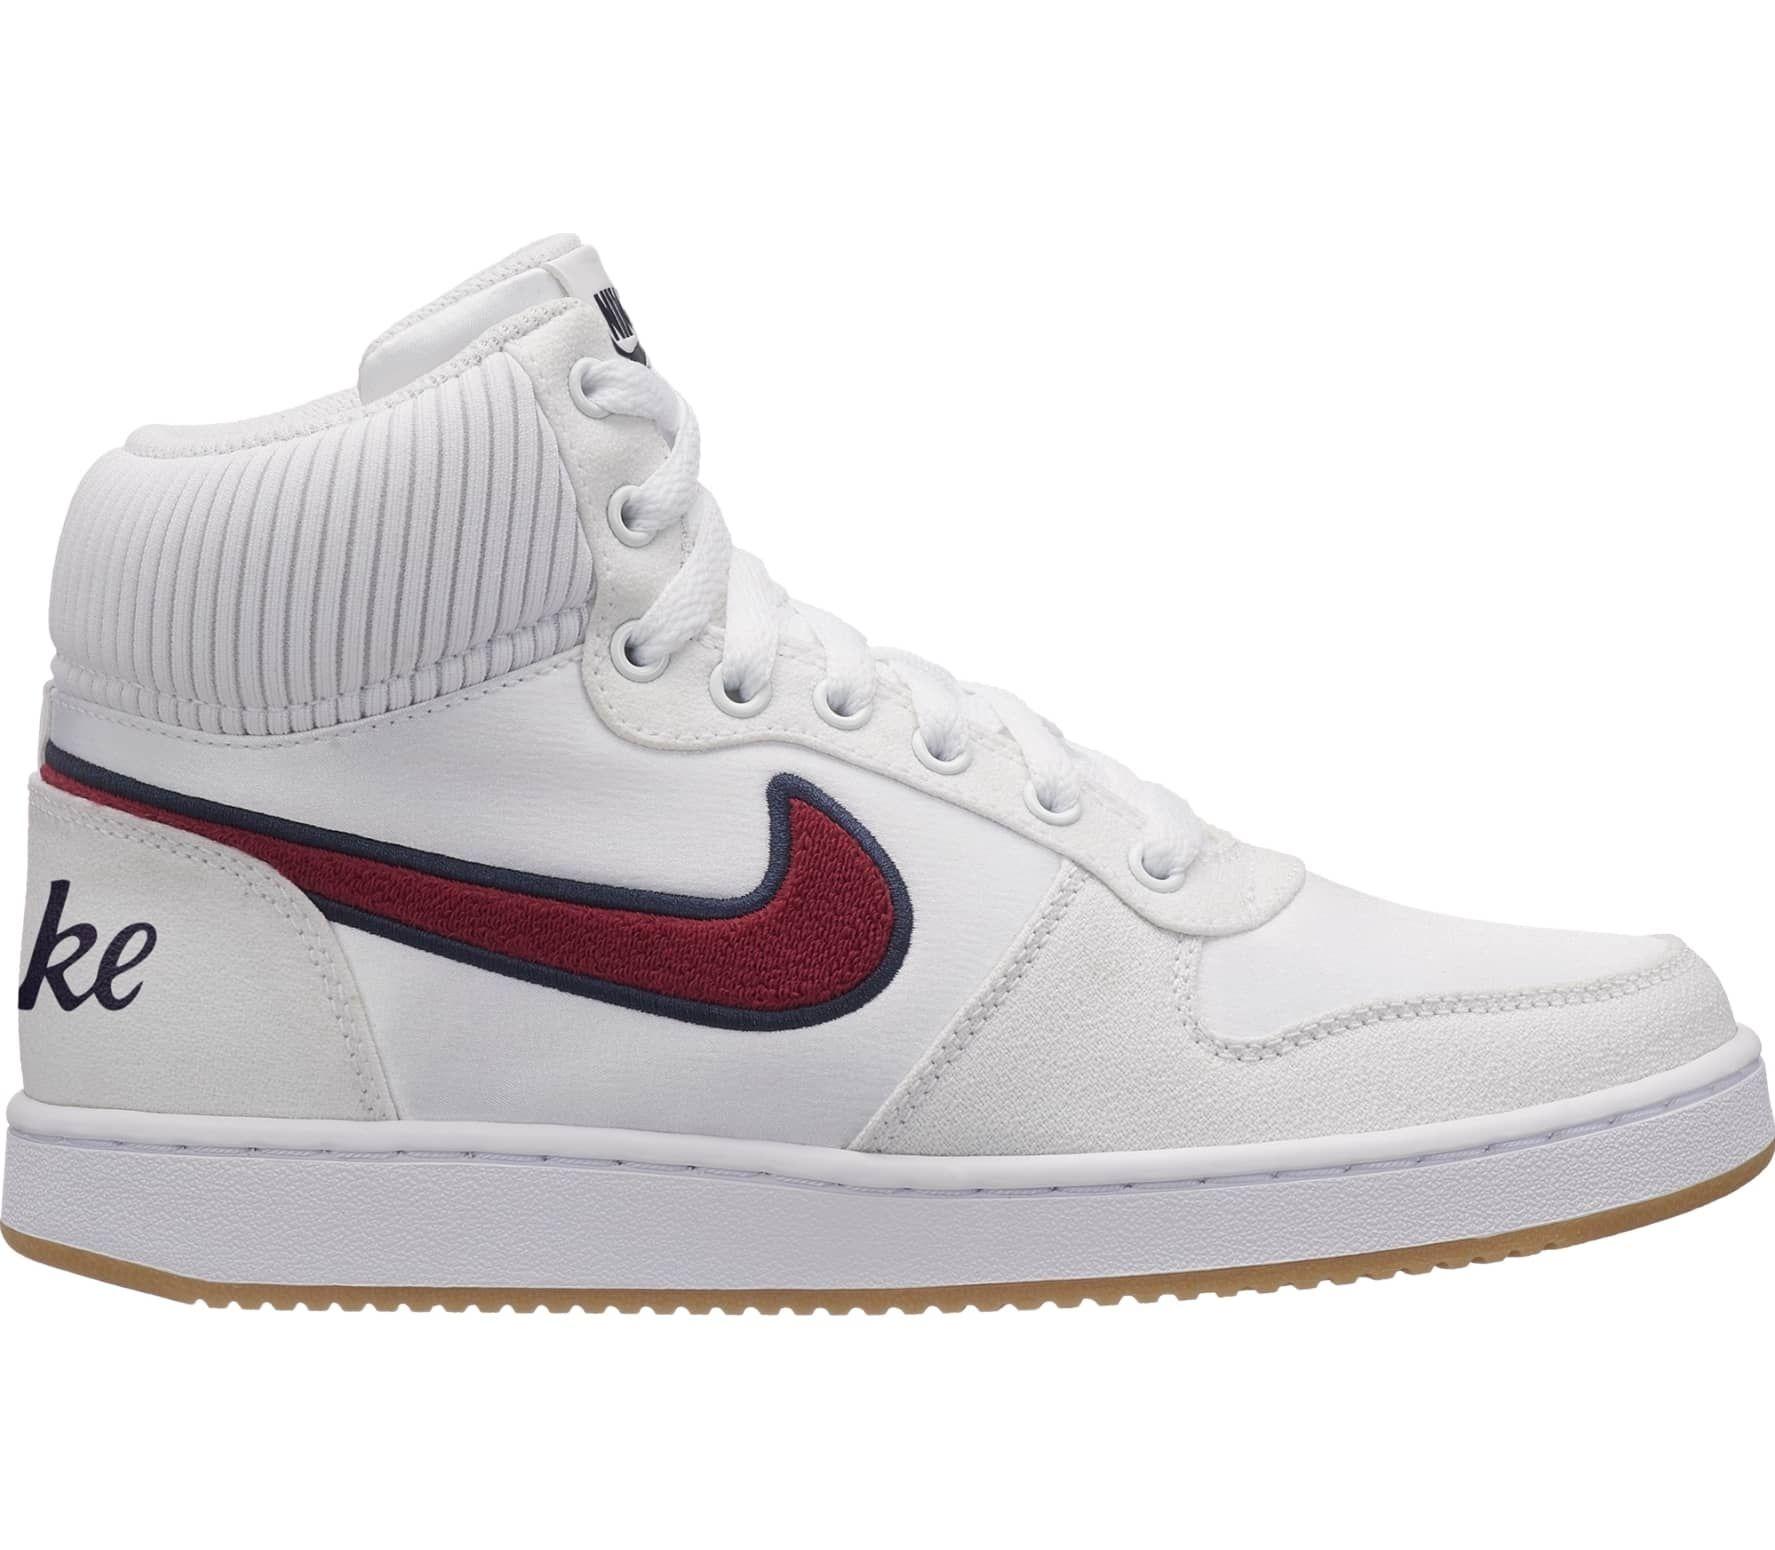 452df11054e95 Nike Sportswear Ebernon Mid Premium Damen Sneaker - online kaufen bei  Keller Sports #Lifestyle #